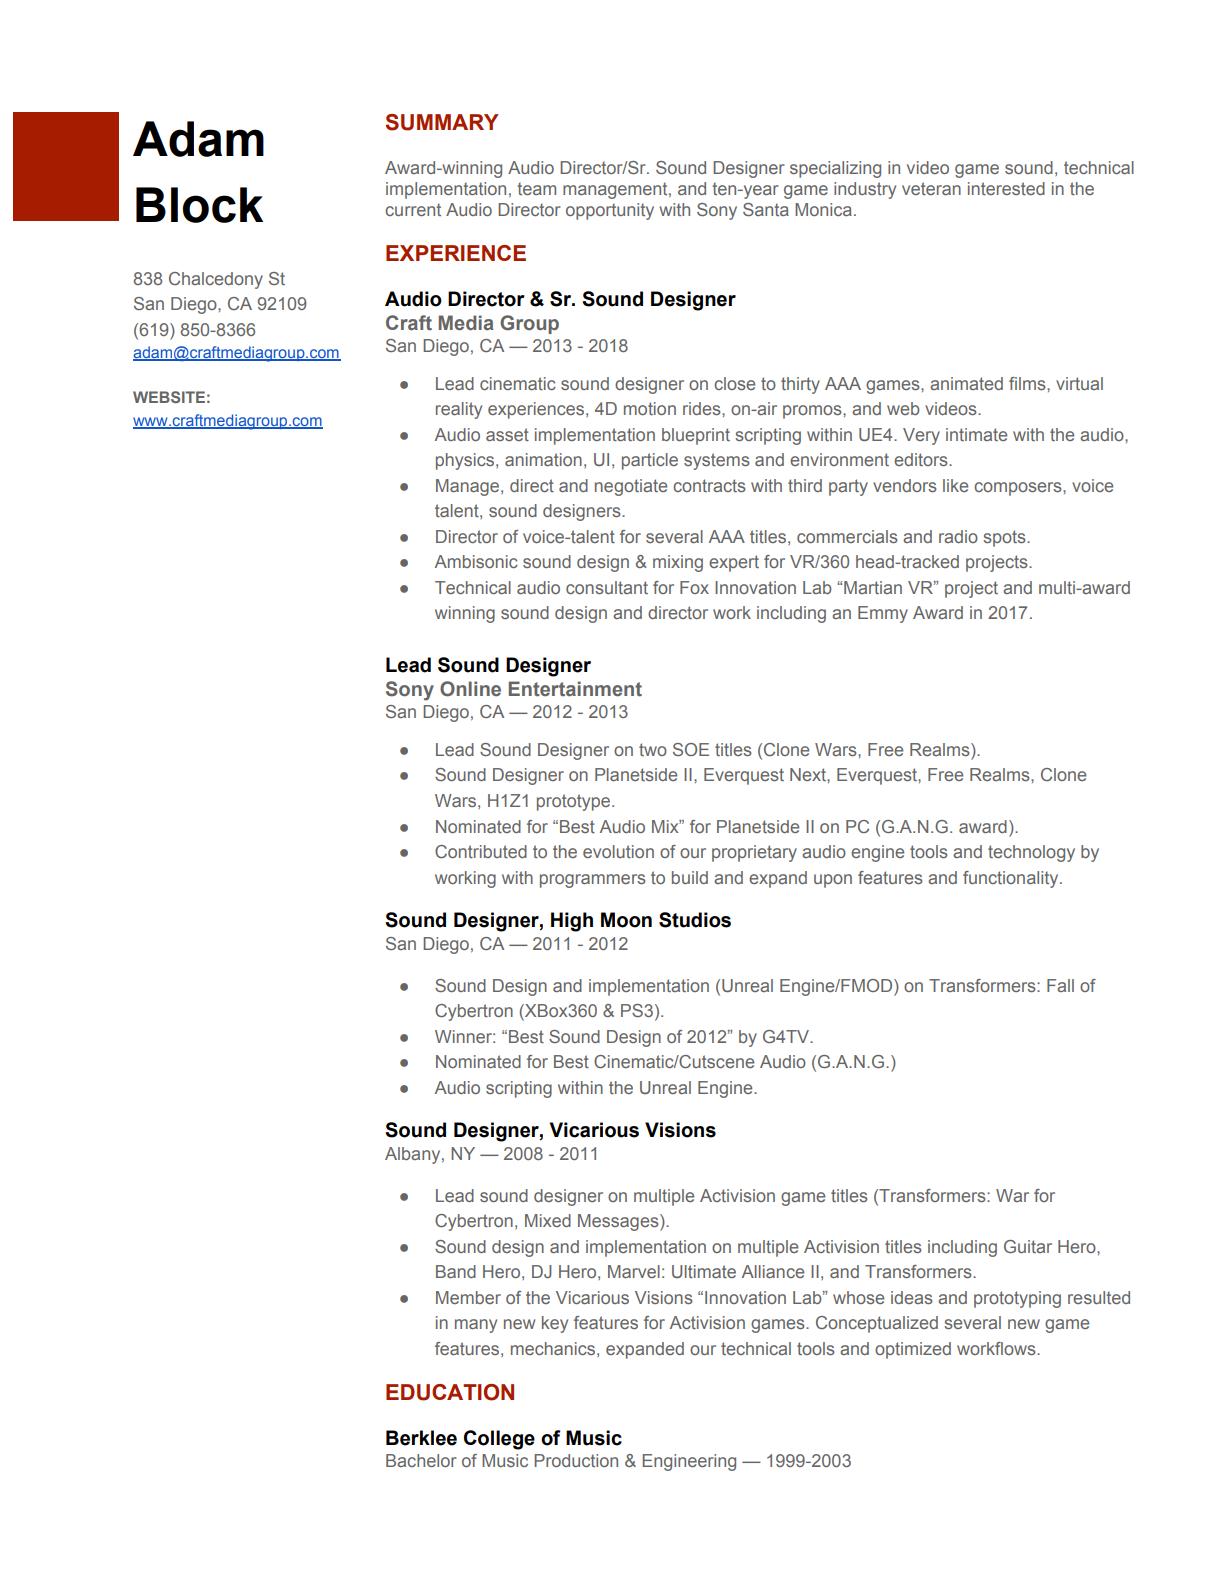 Resume_Image_01.PNG